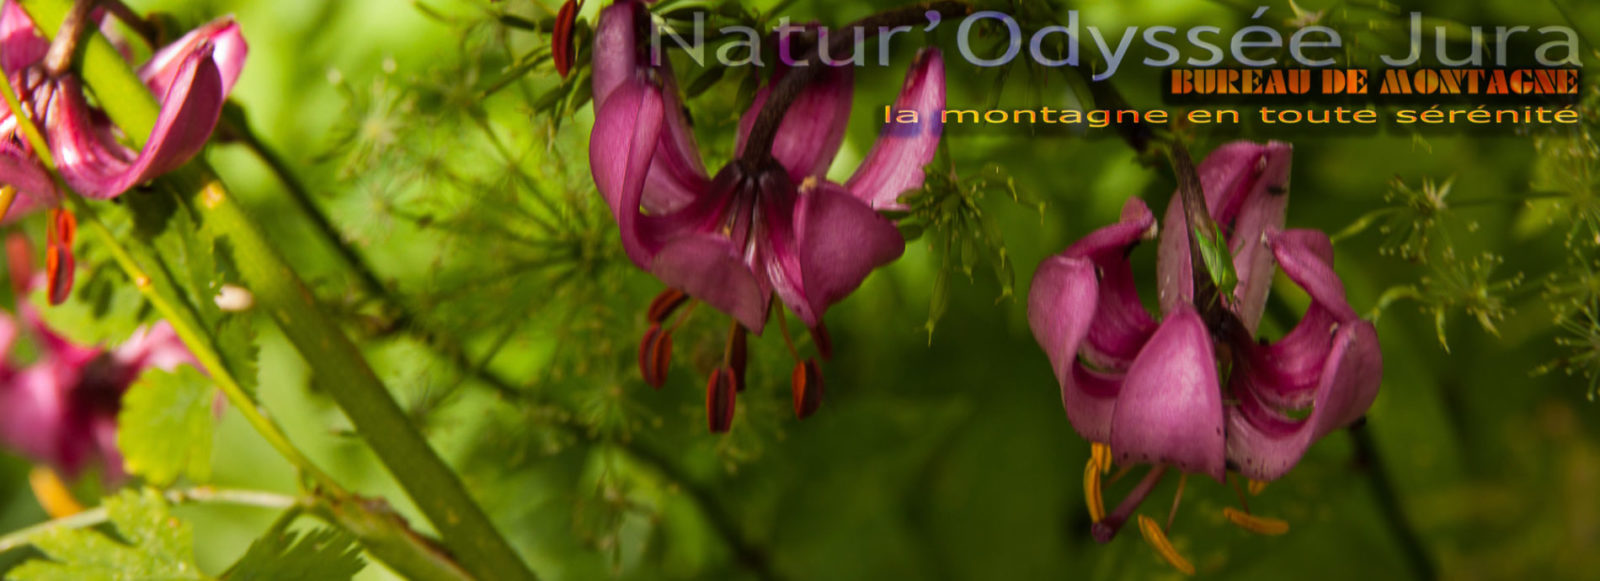 Natur'Odyssée Jura fleur